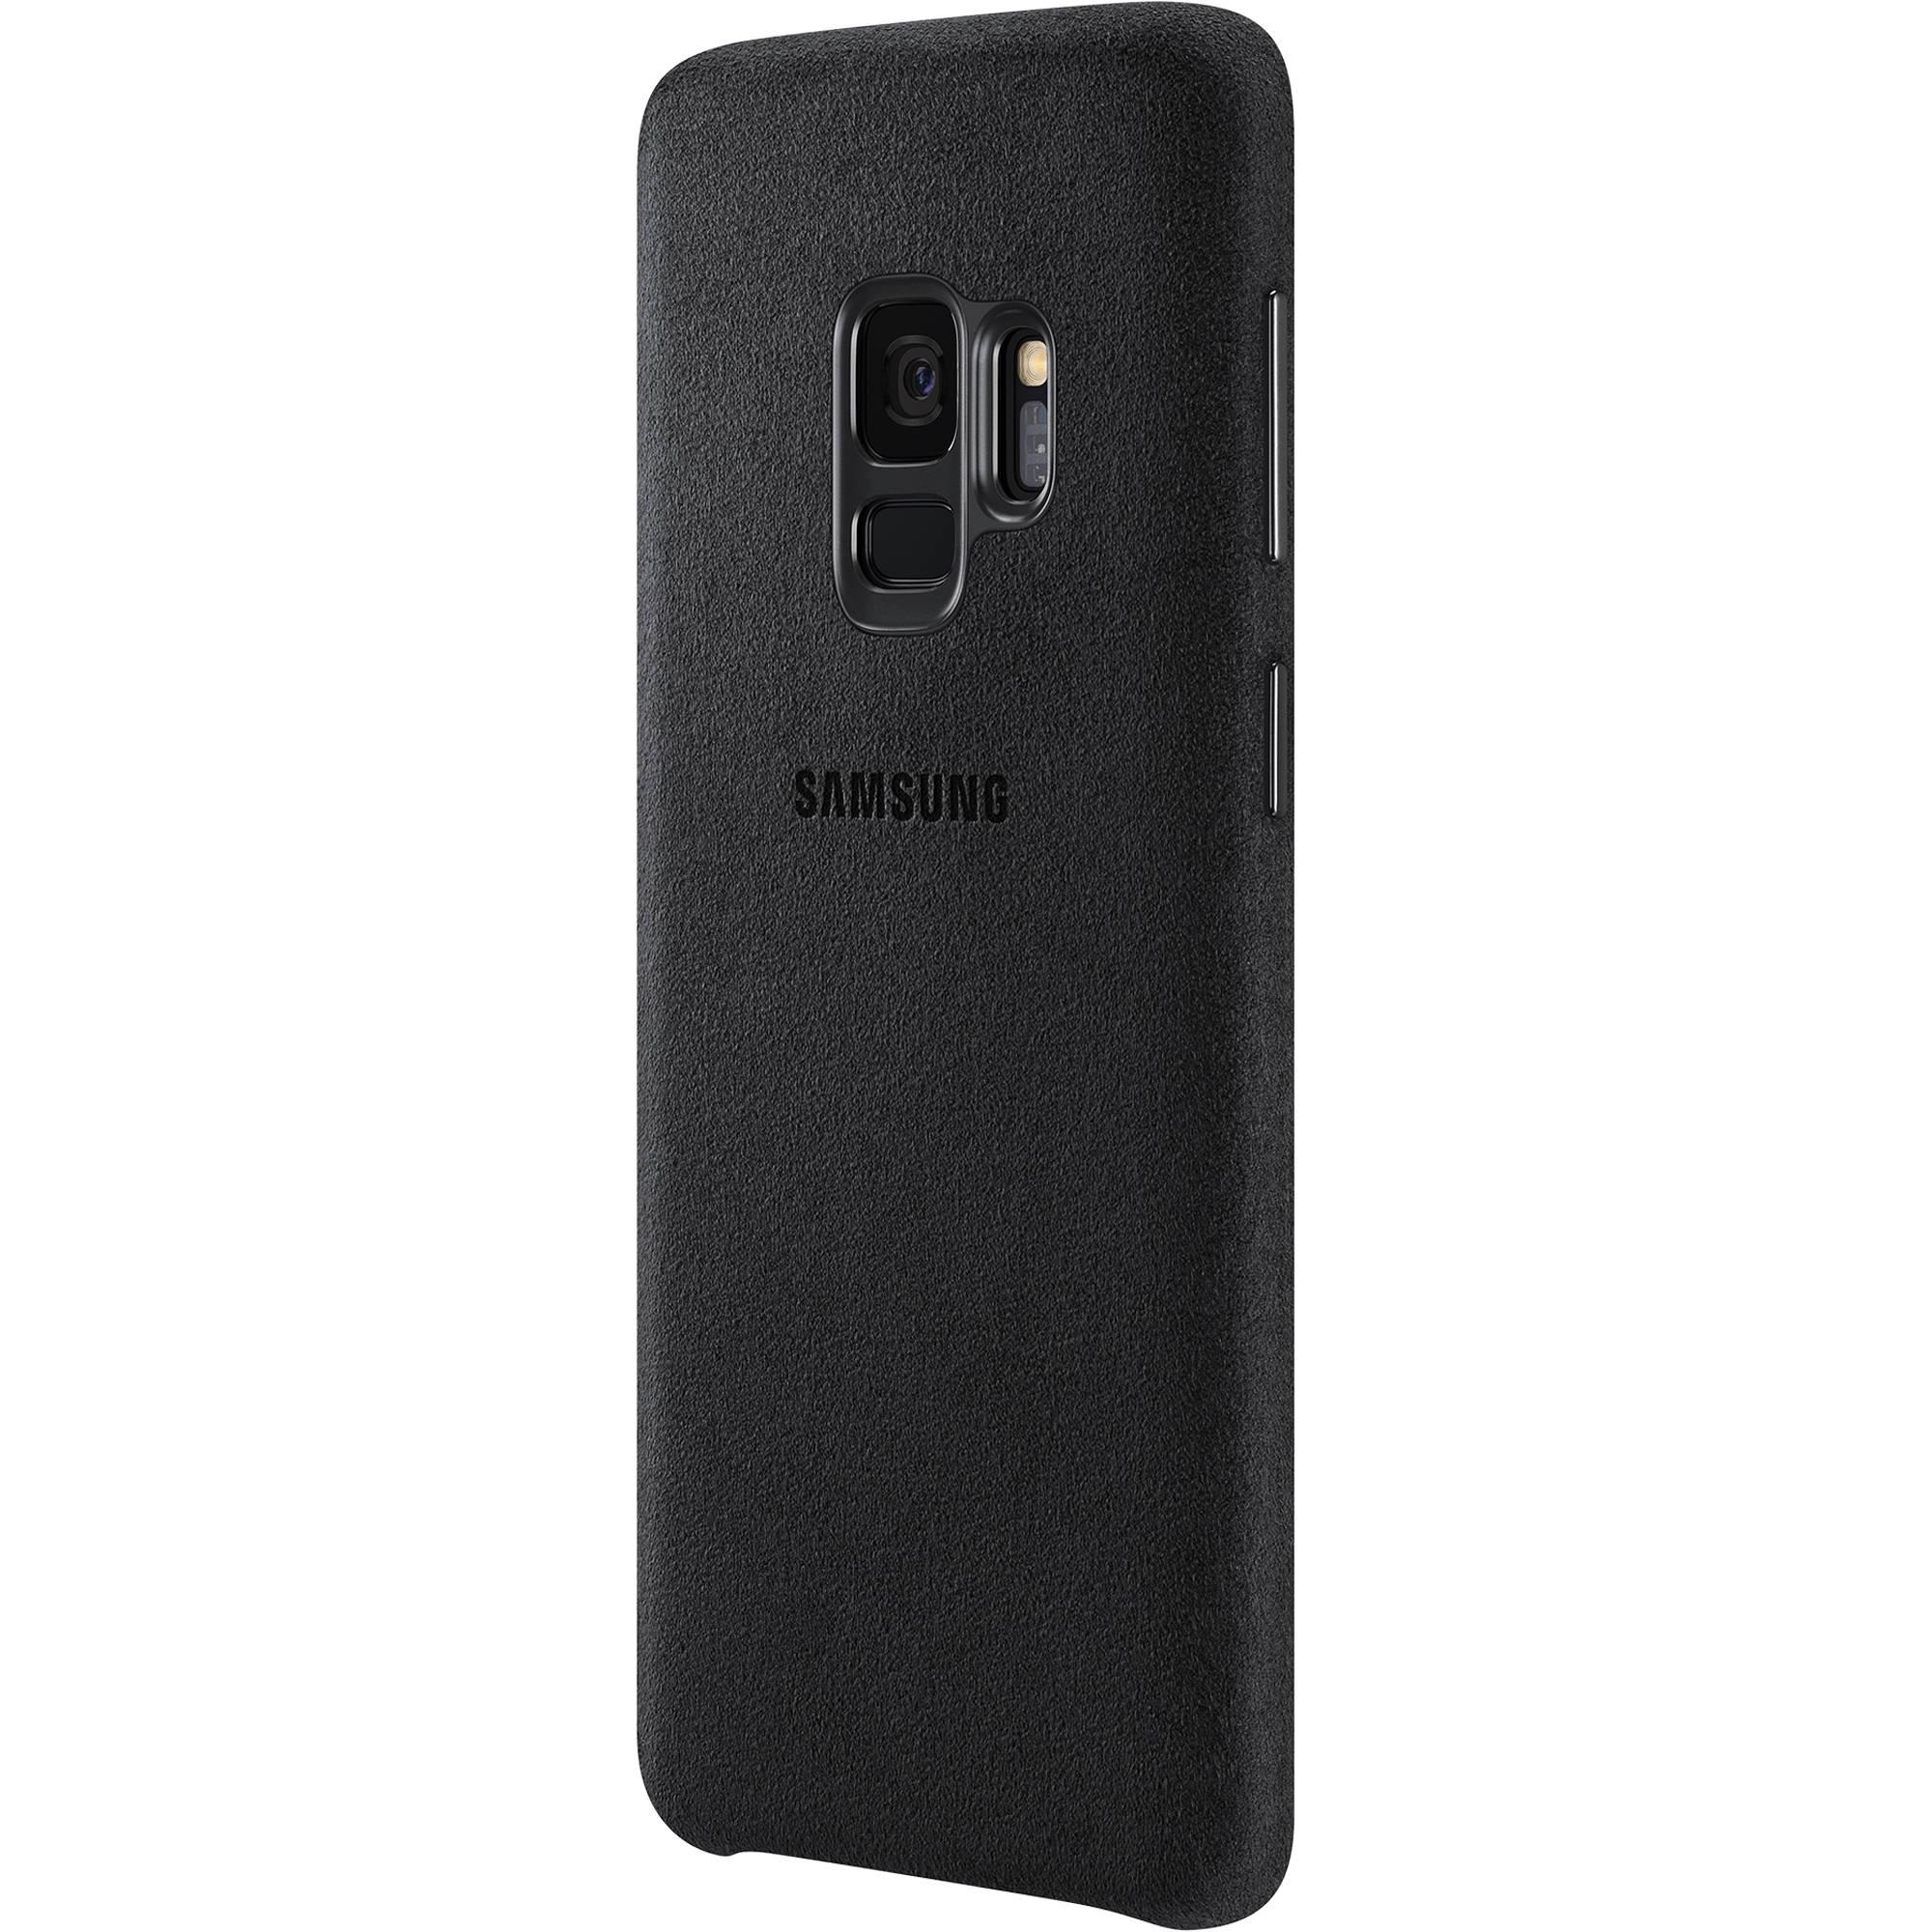 online store f129e b2696 Samsung Alcantara Case for Galaxy S9 (Black)